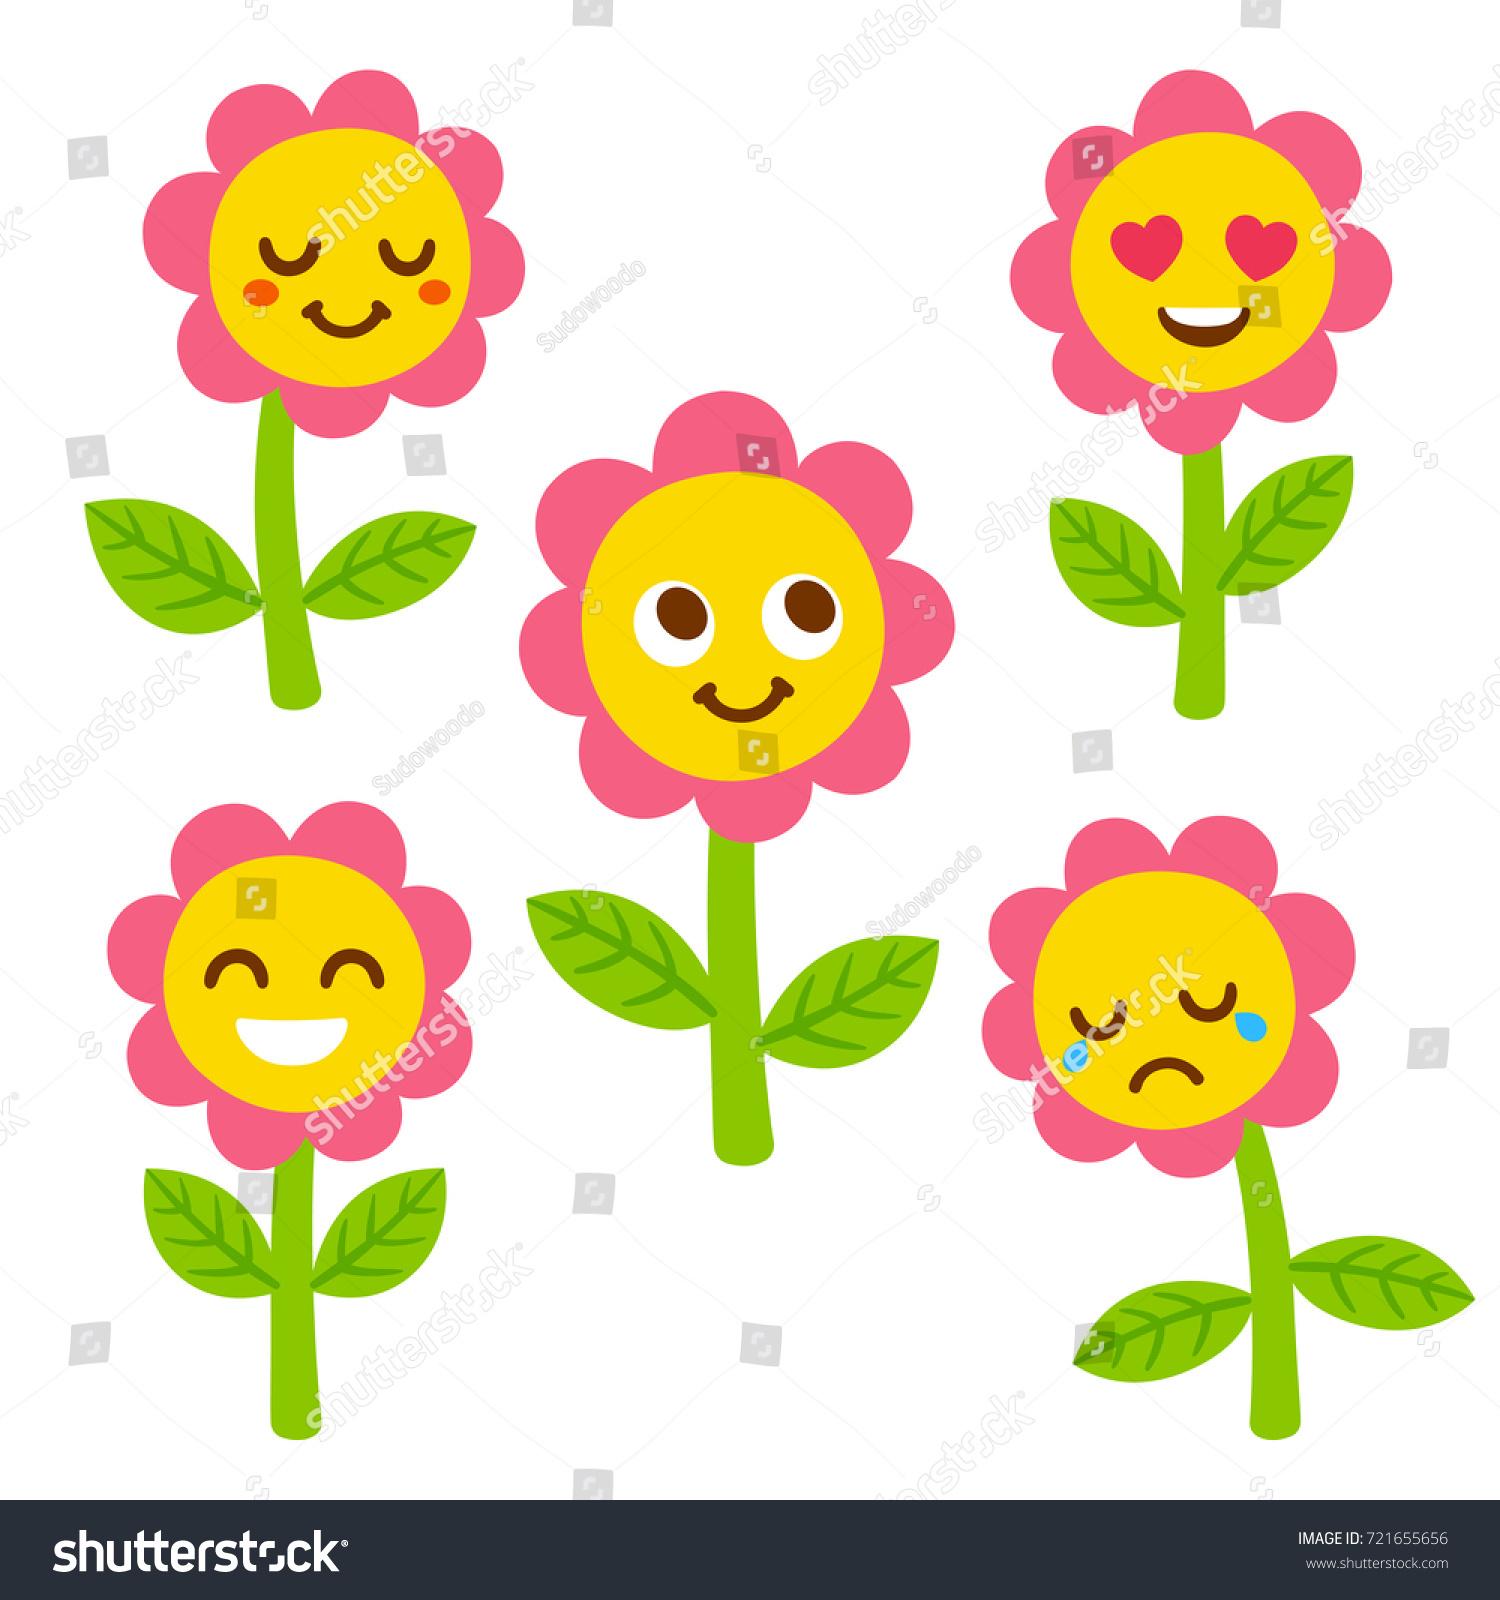 Smiley face flower bouquet gallery flower wallpaper hd smiley face flower bouquet choice image flower wallpaper hd enchanting smiley face flower bouquet model images izmirmasajfo